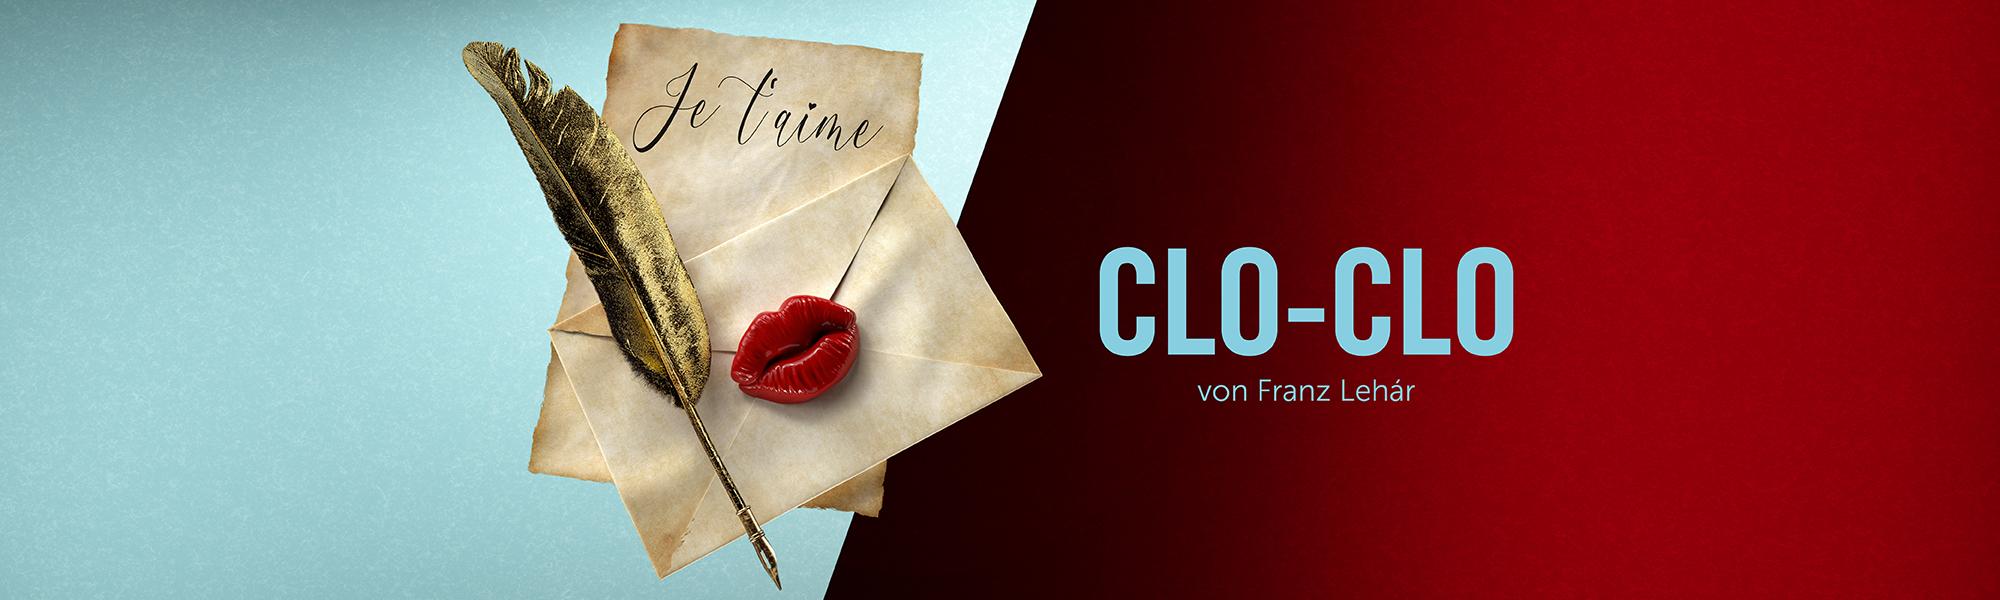 Clo-Clo (Slider)